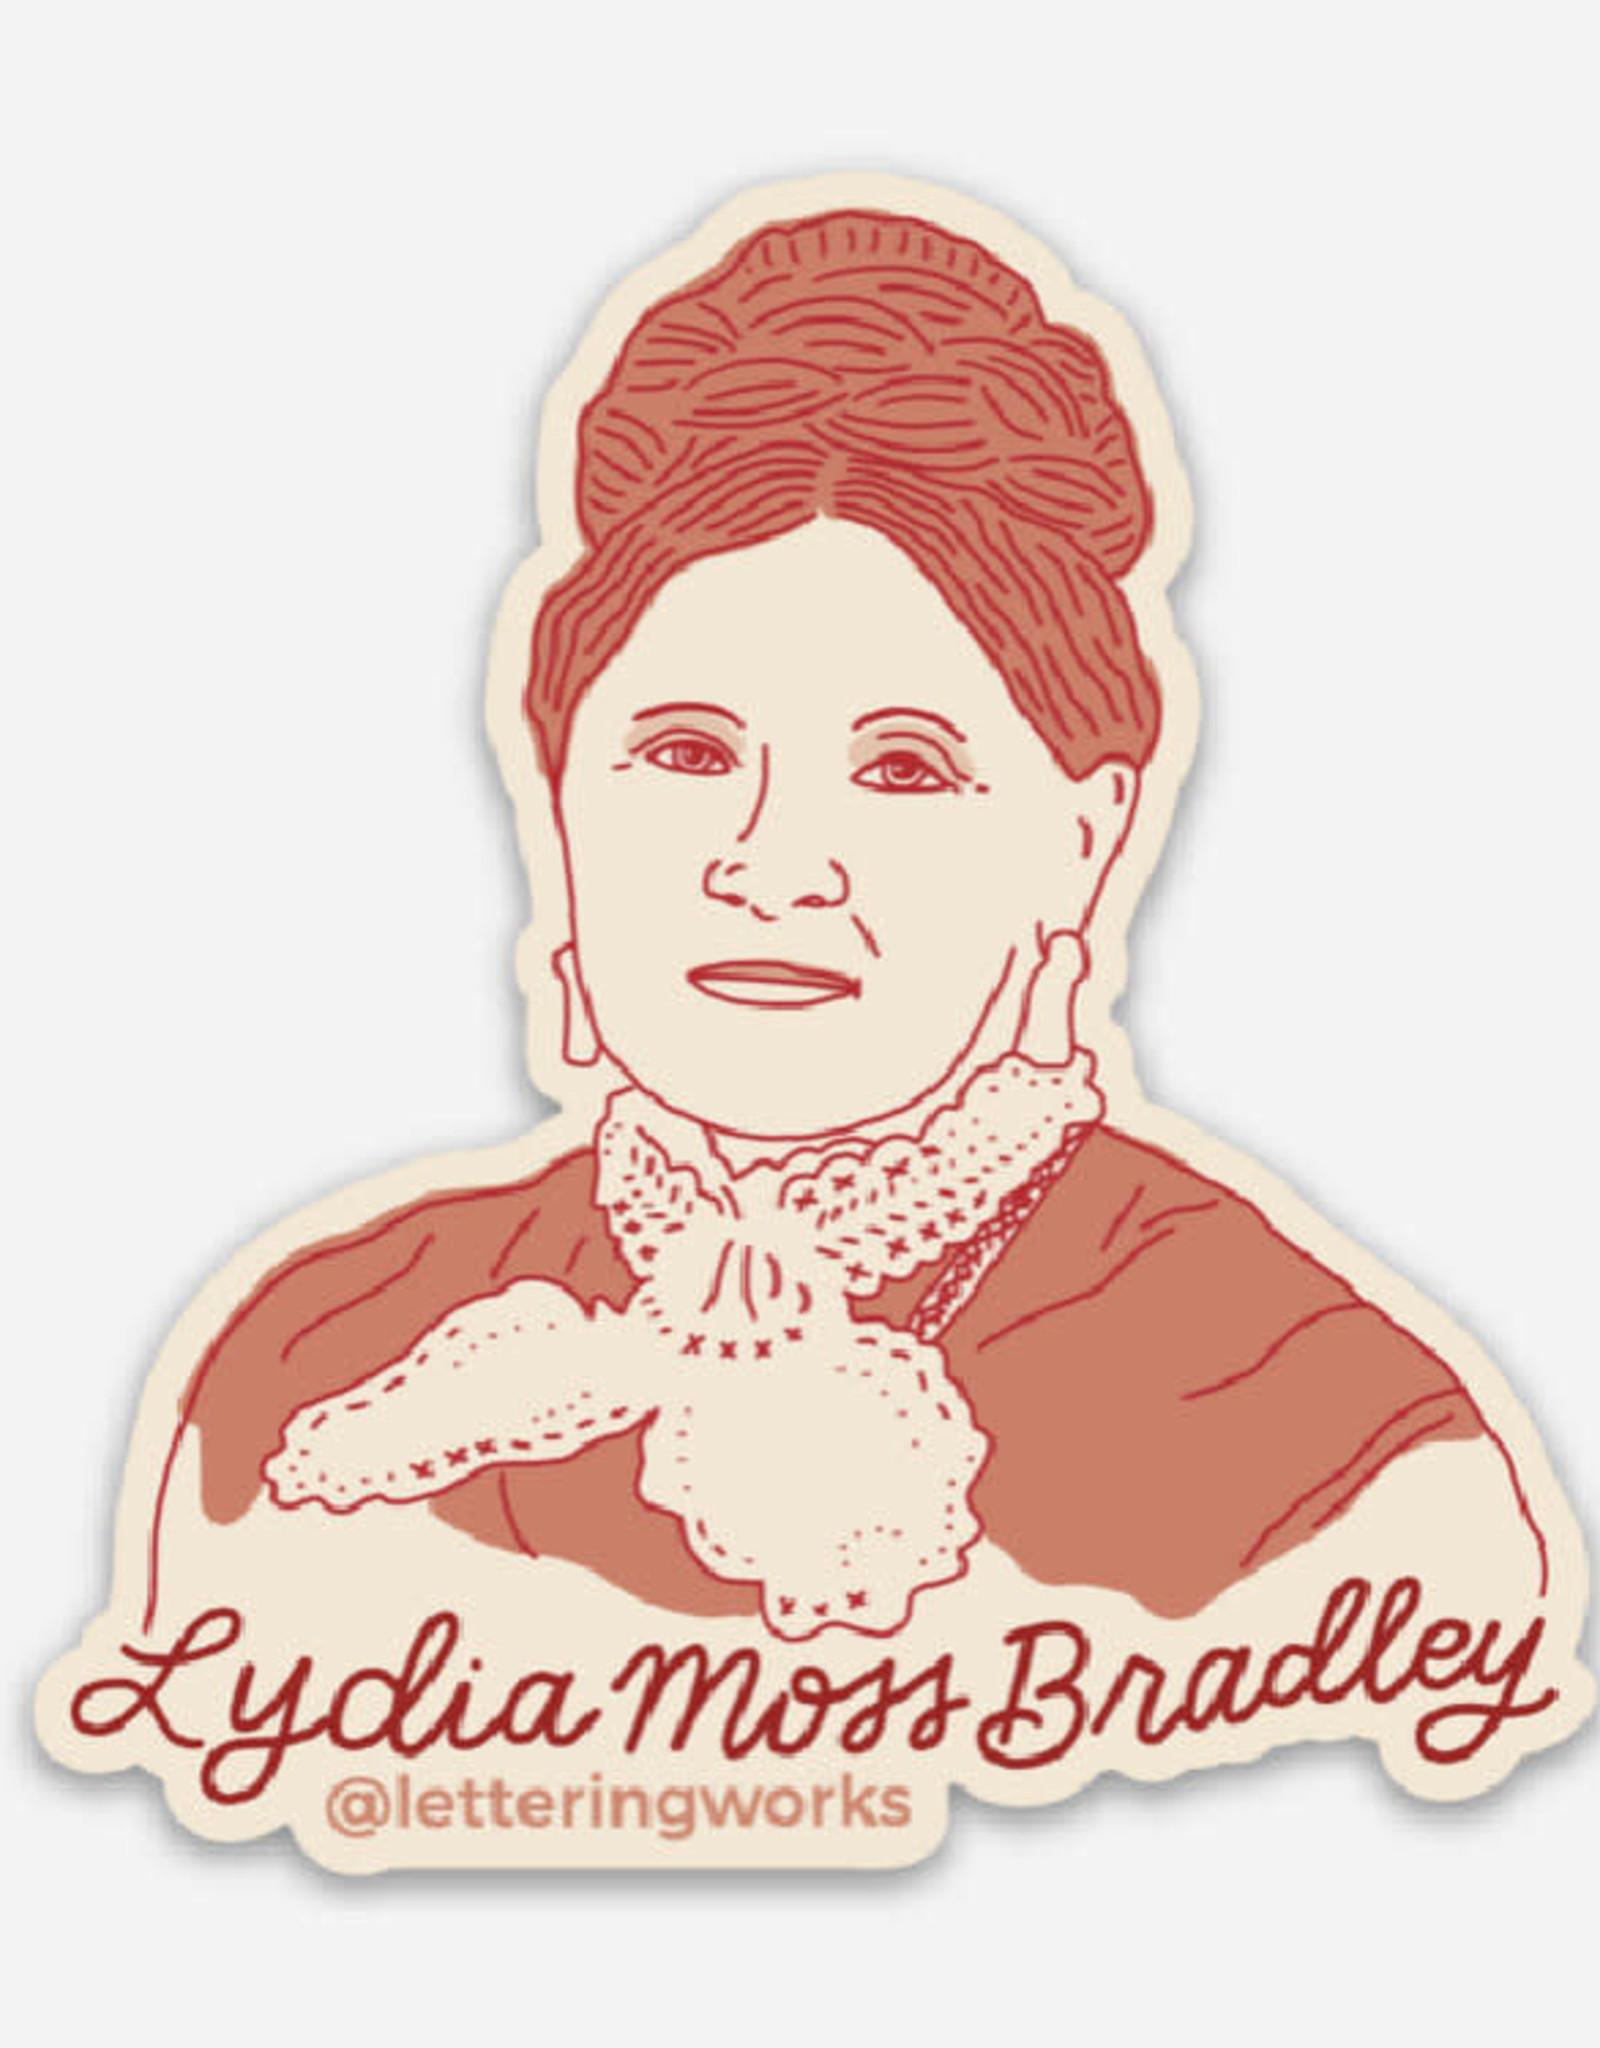 UA Merch Lydia Moss Bradley Sticker